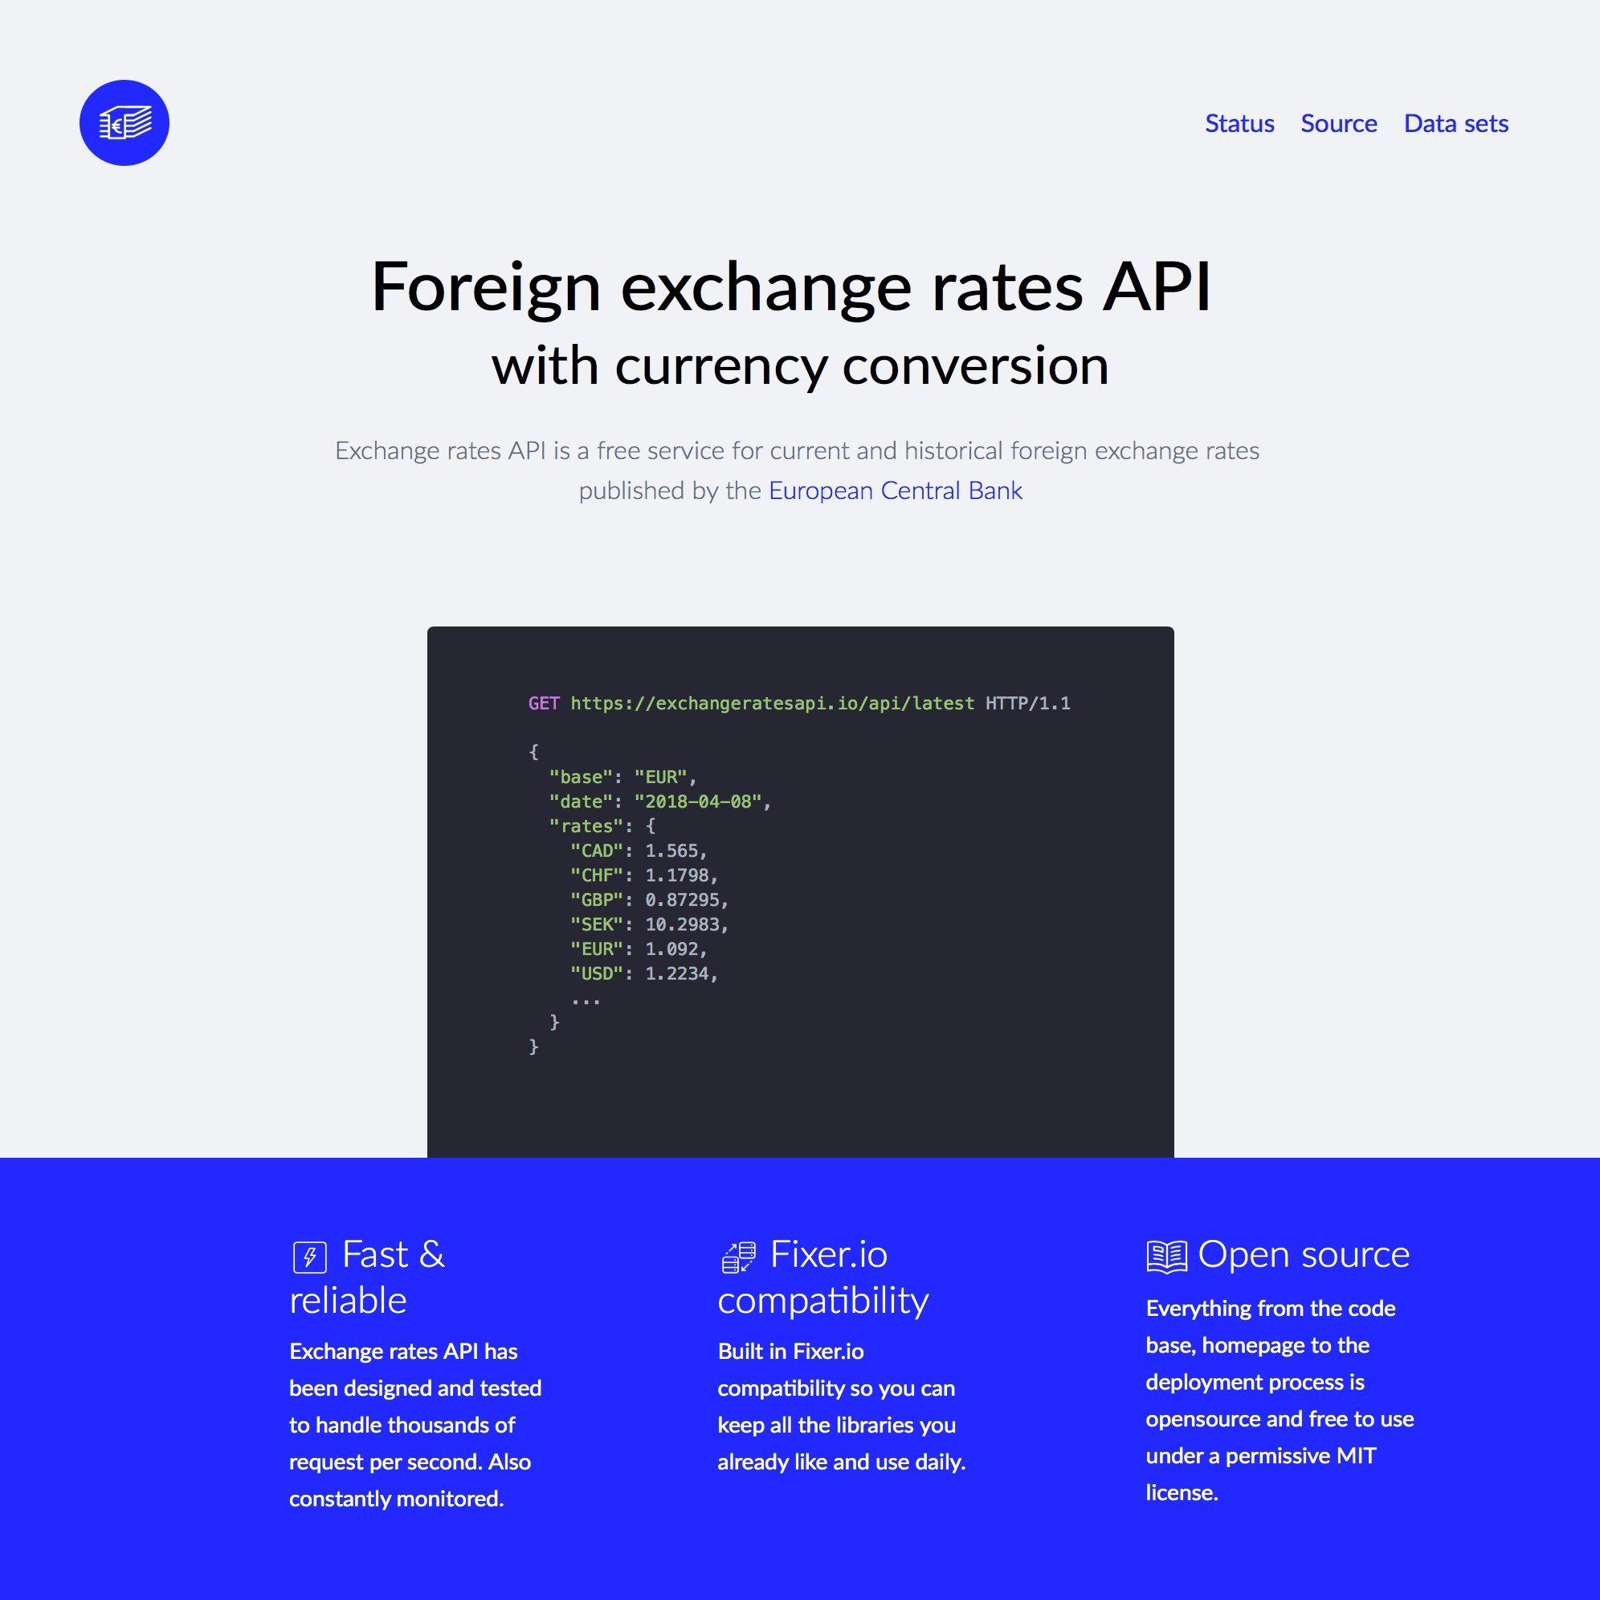 exchangeratesapi io Alternatives and Similar Websites and